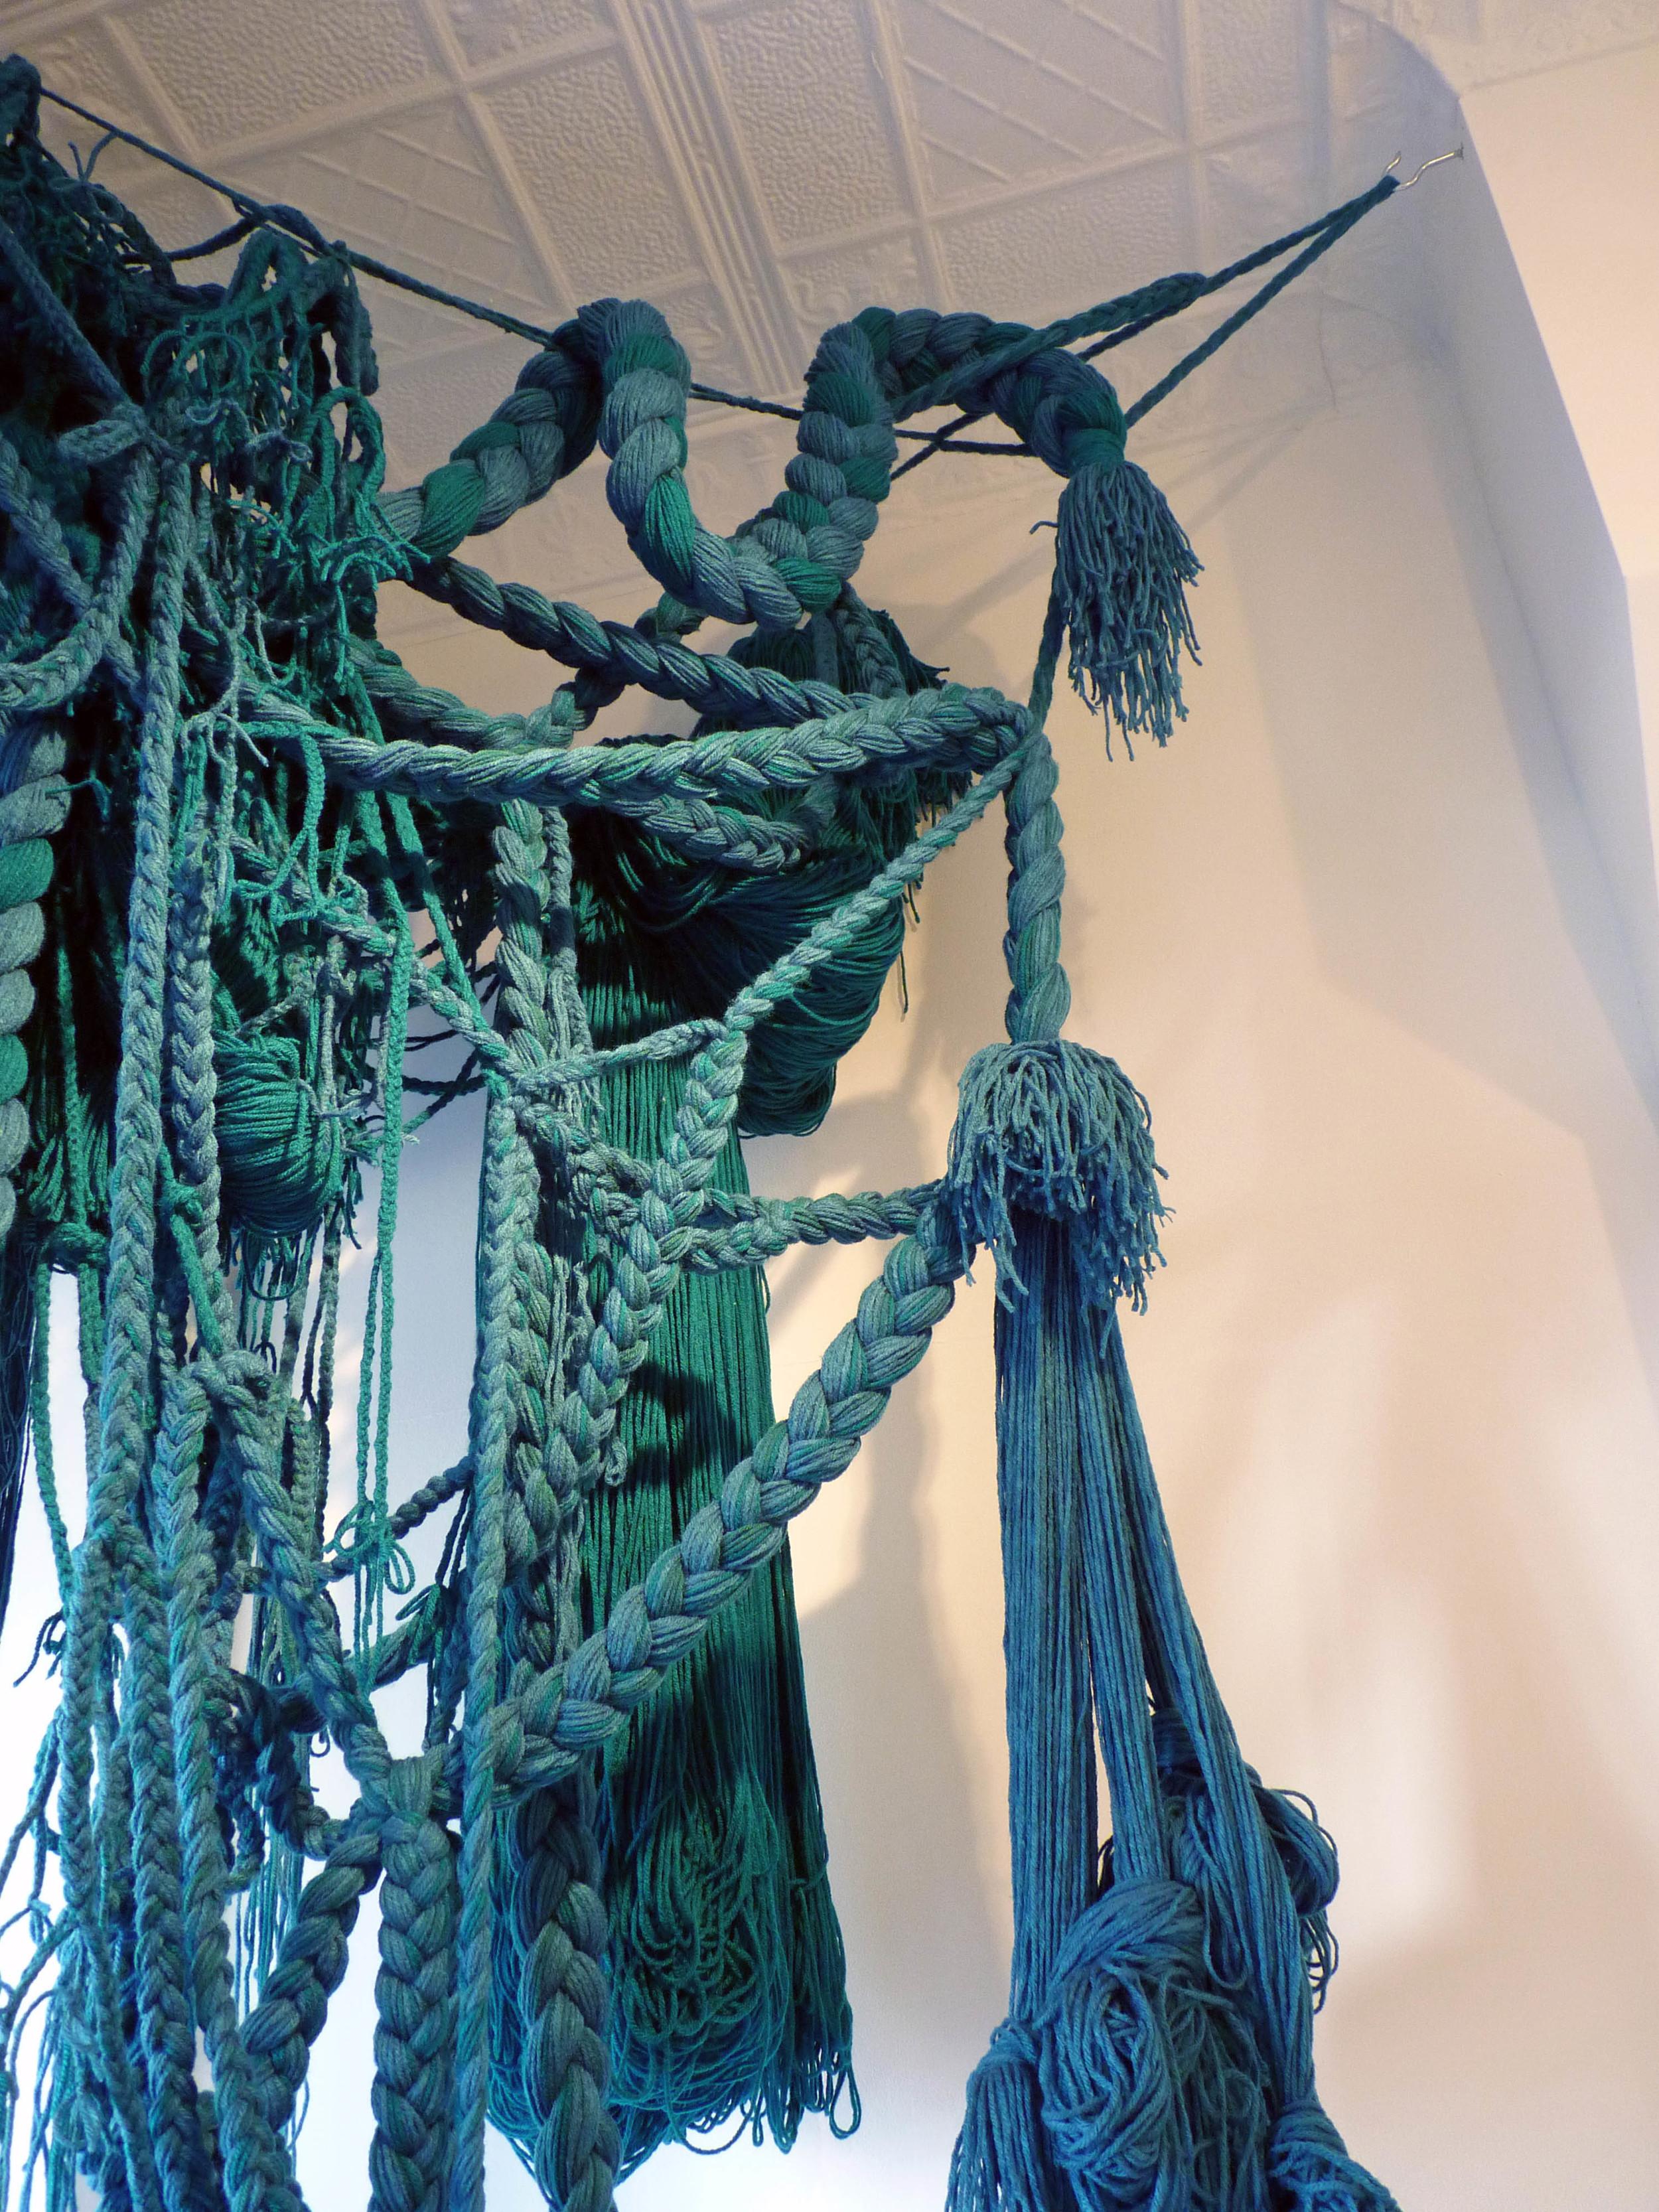 The Falls, 2010, Acrylic yarn, 5' x 3' x 9' (Detail)